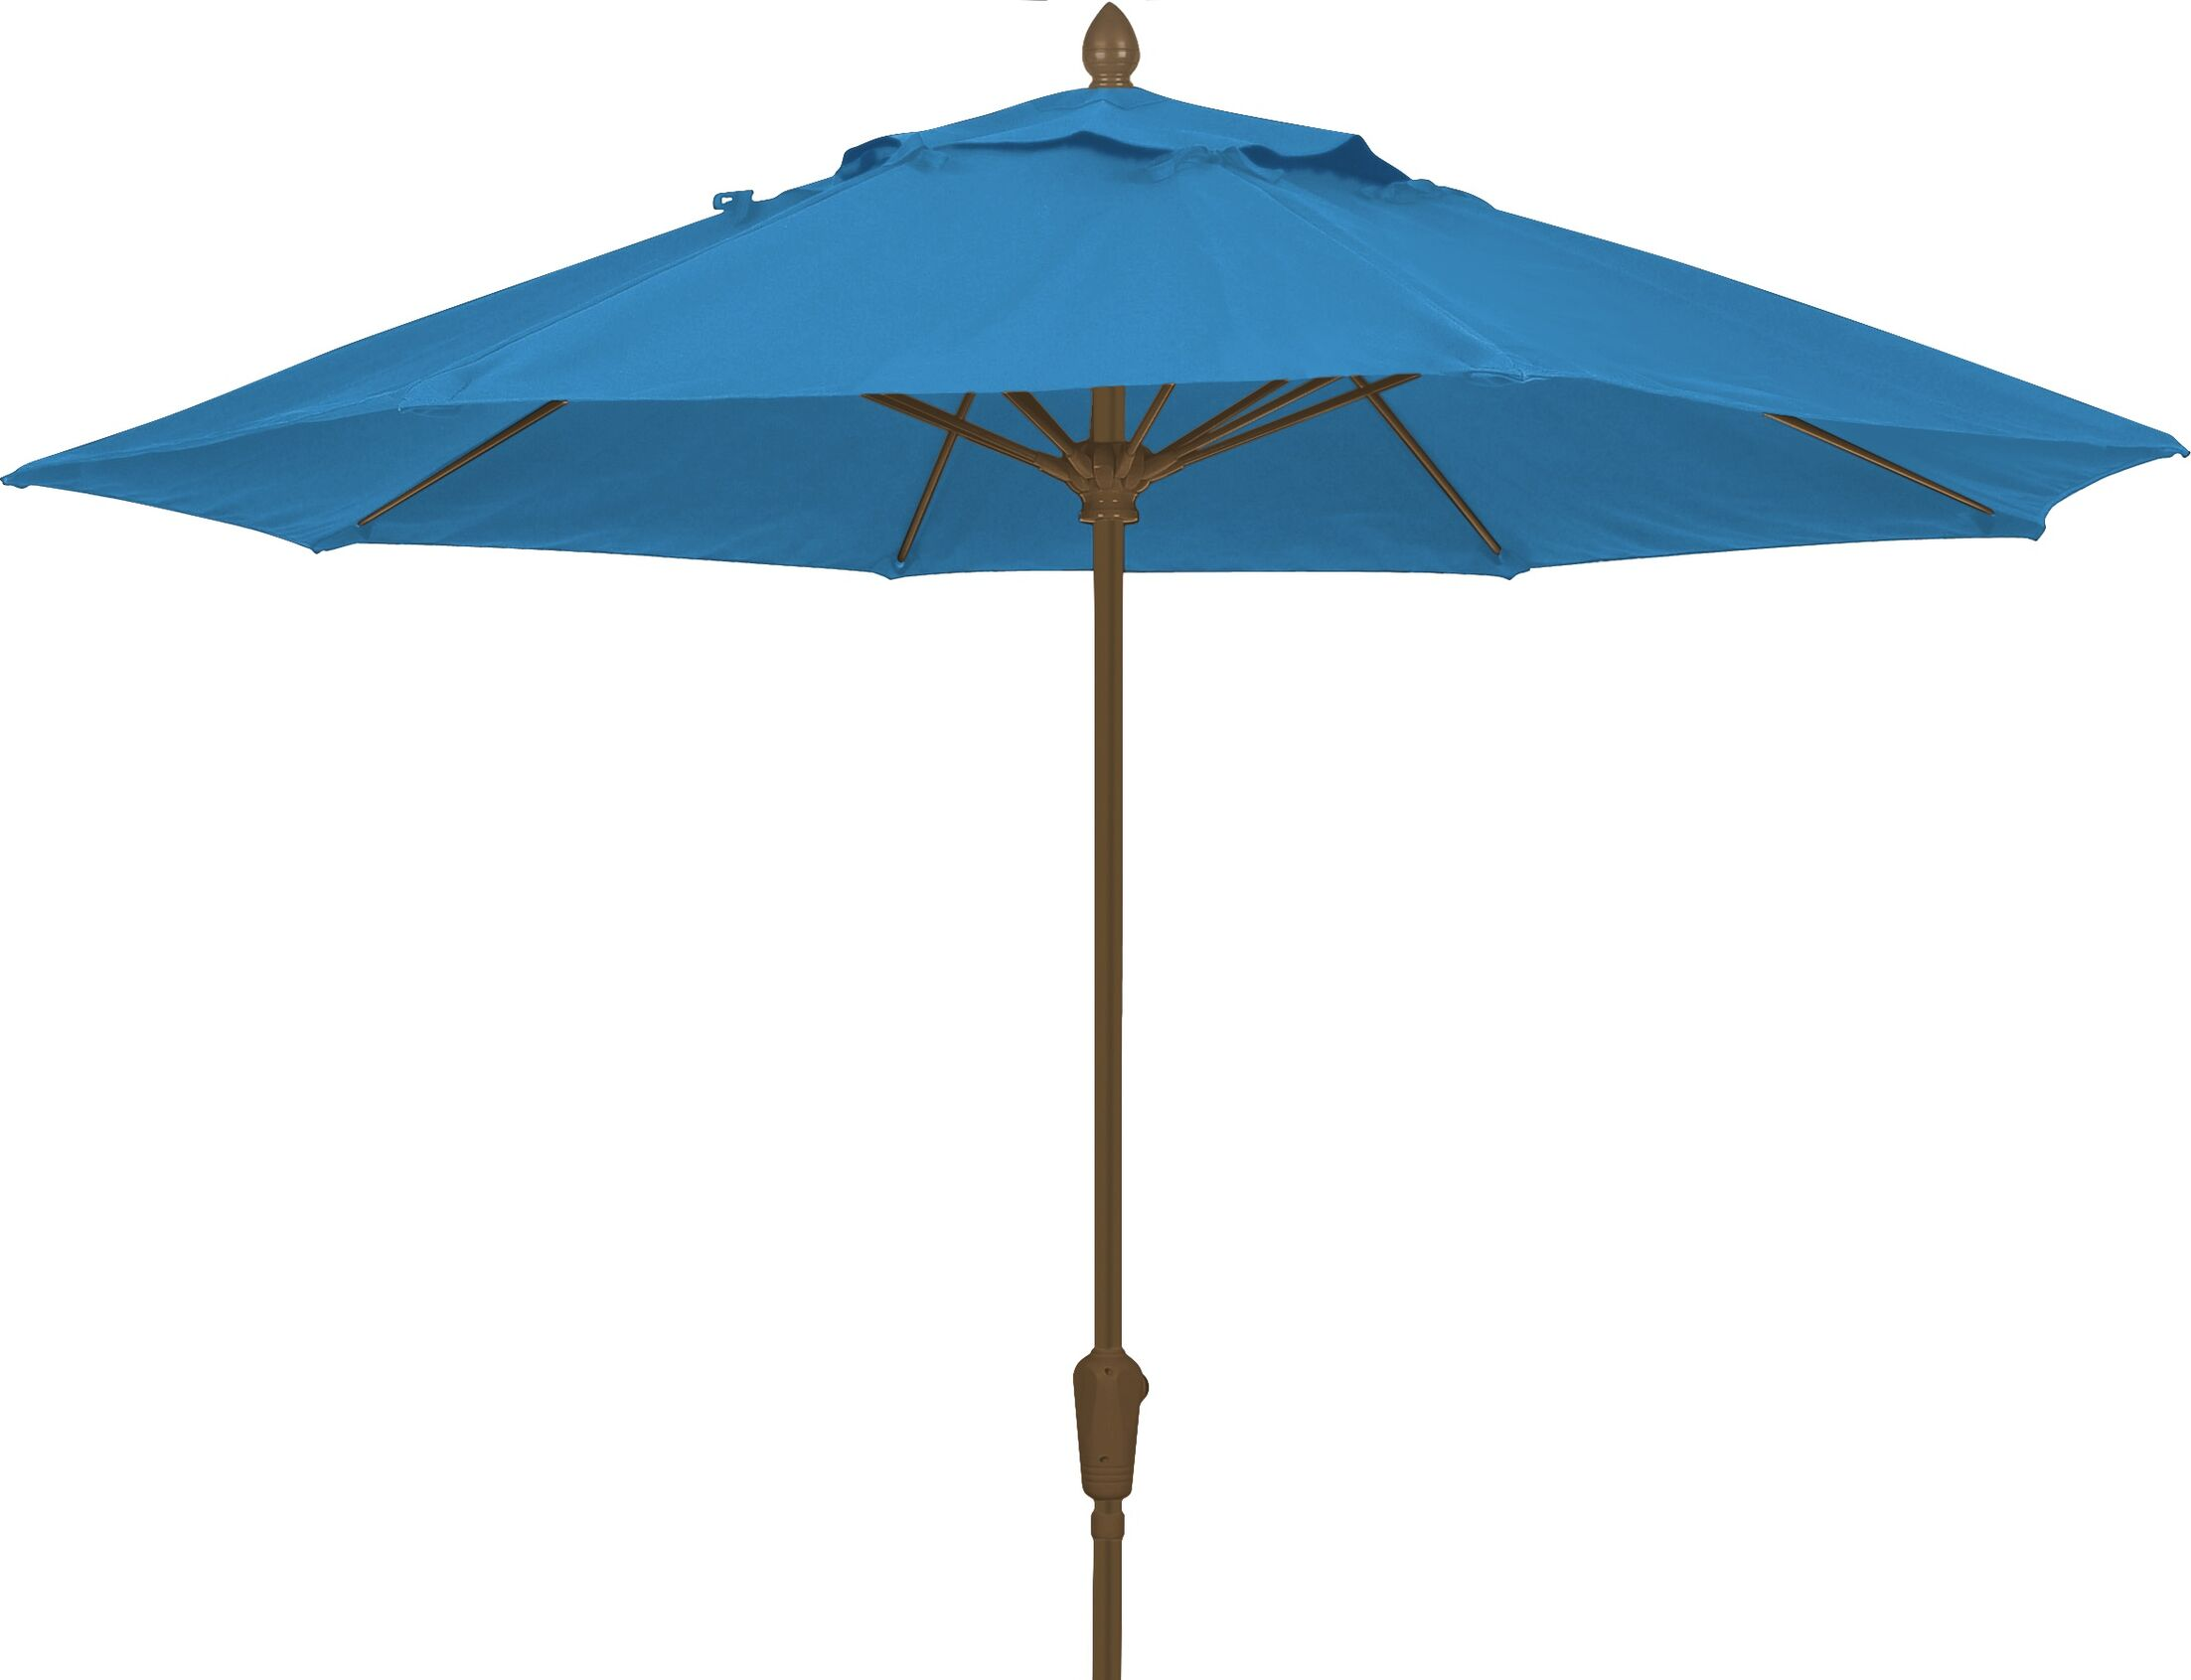 Prestige 9' Market Umbrella Frame Finish: White, Fabric: Sky Blue